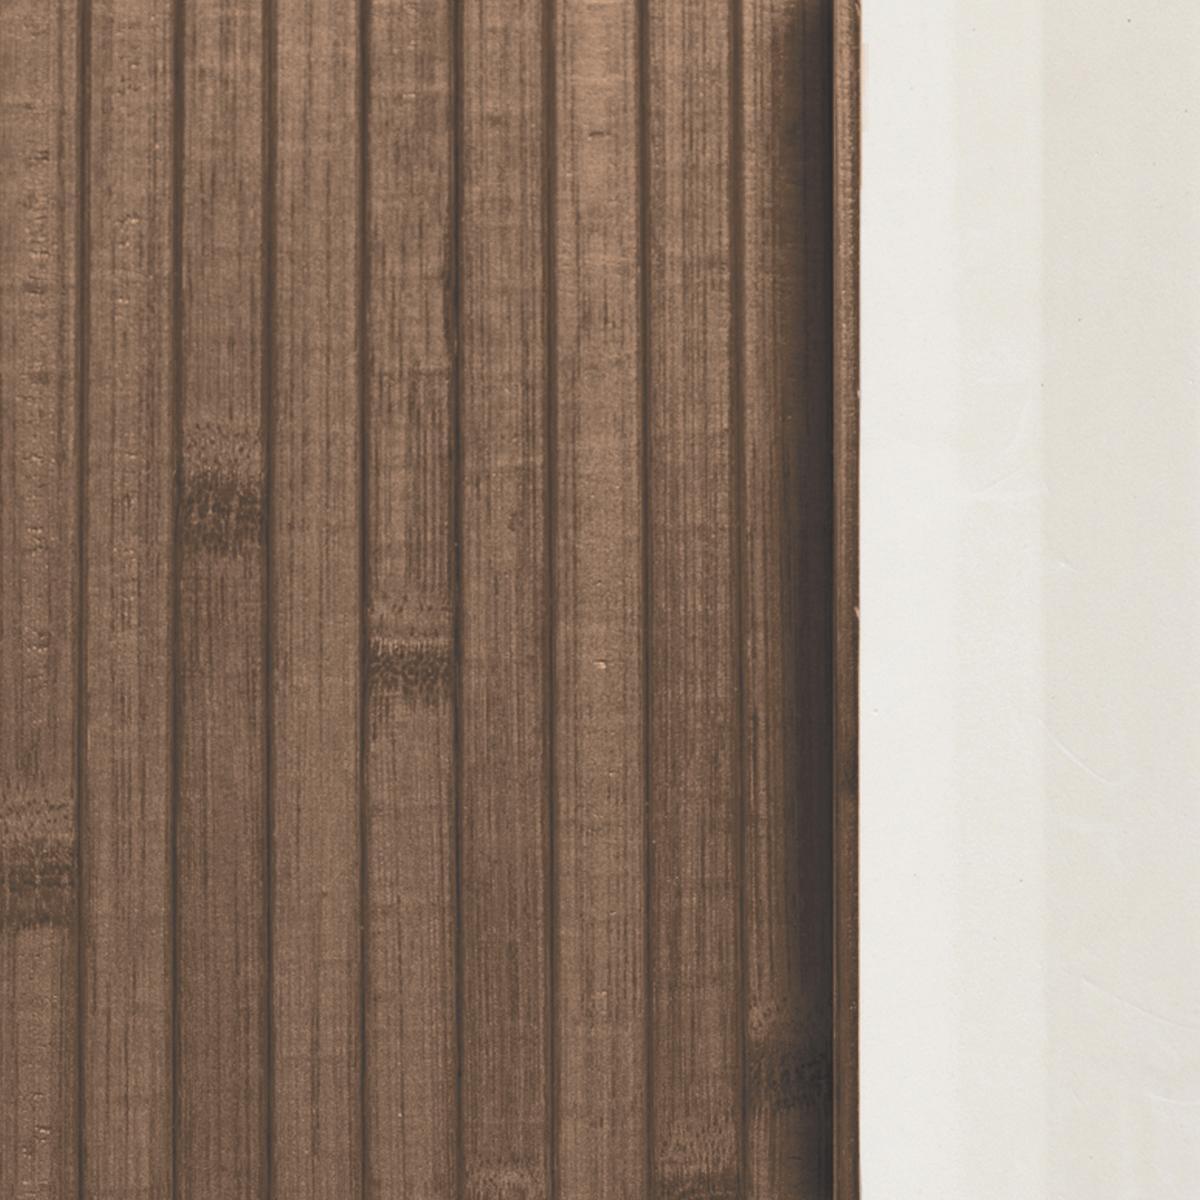 Passatoia Bamboo open , cioccolato, 50x240 - 4